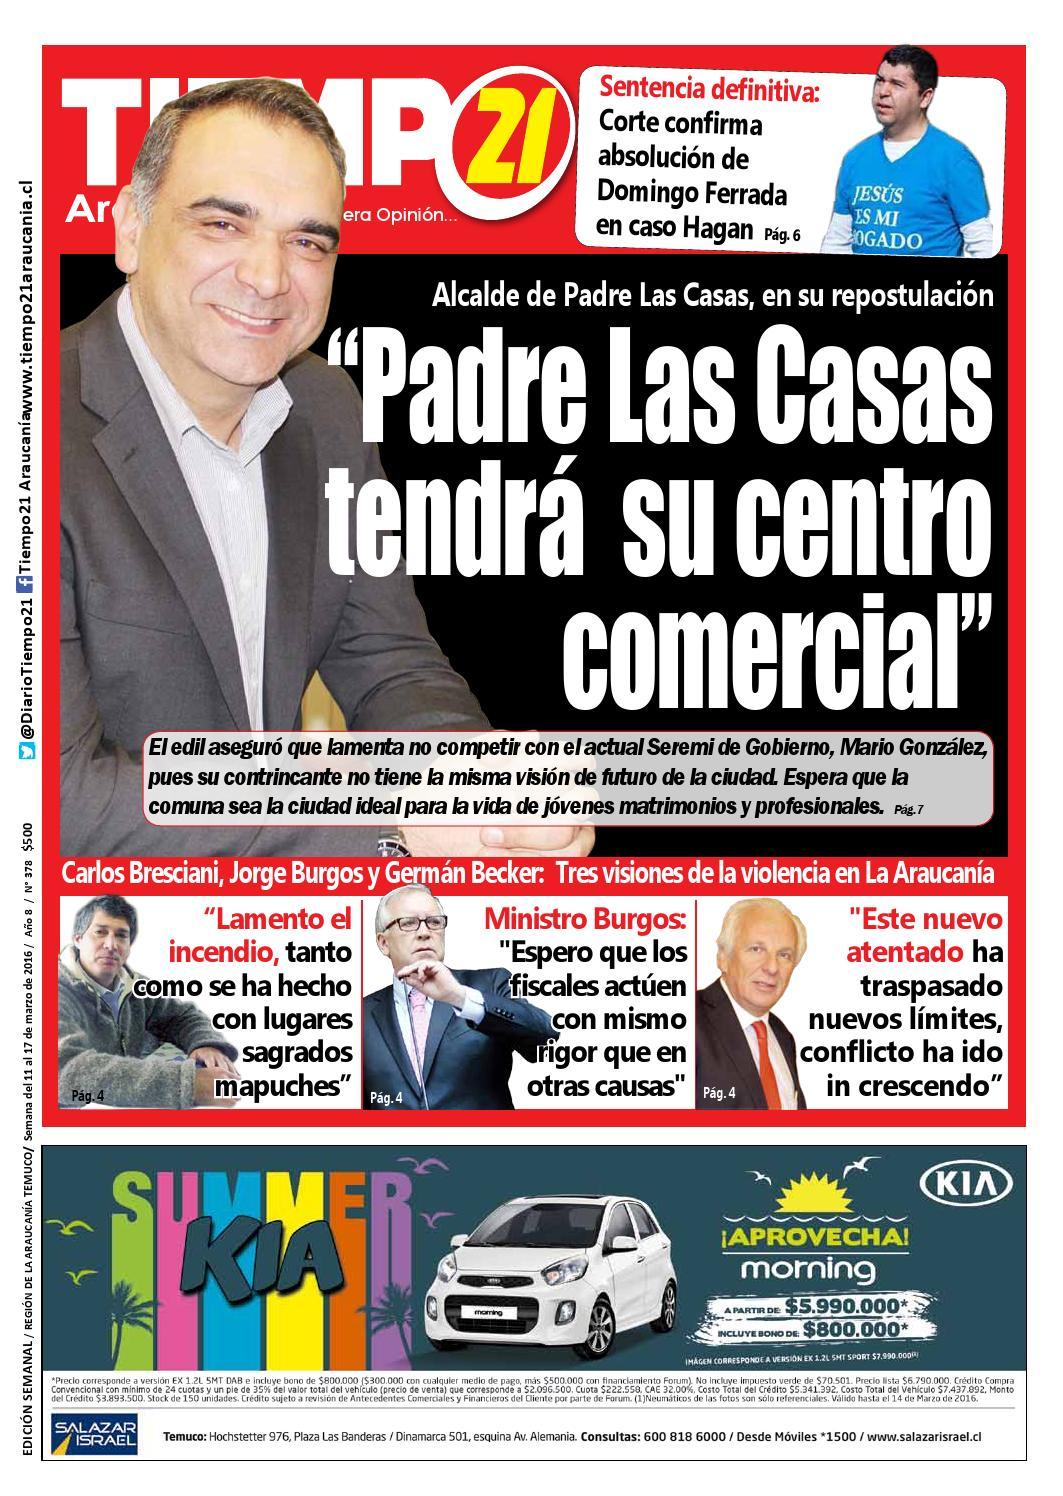 Edici N 378 Alcalde Juan Eduardo Delgado Padre Las Casas Tendr  # Muebles Fourcade Limitada